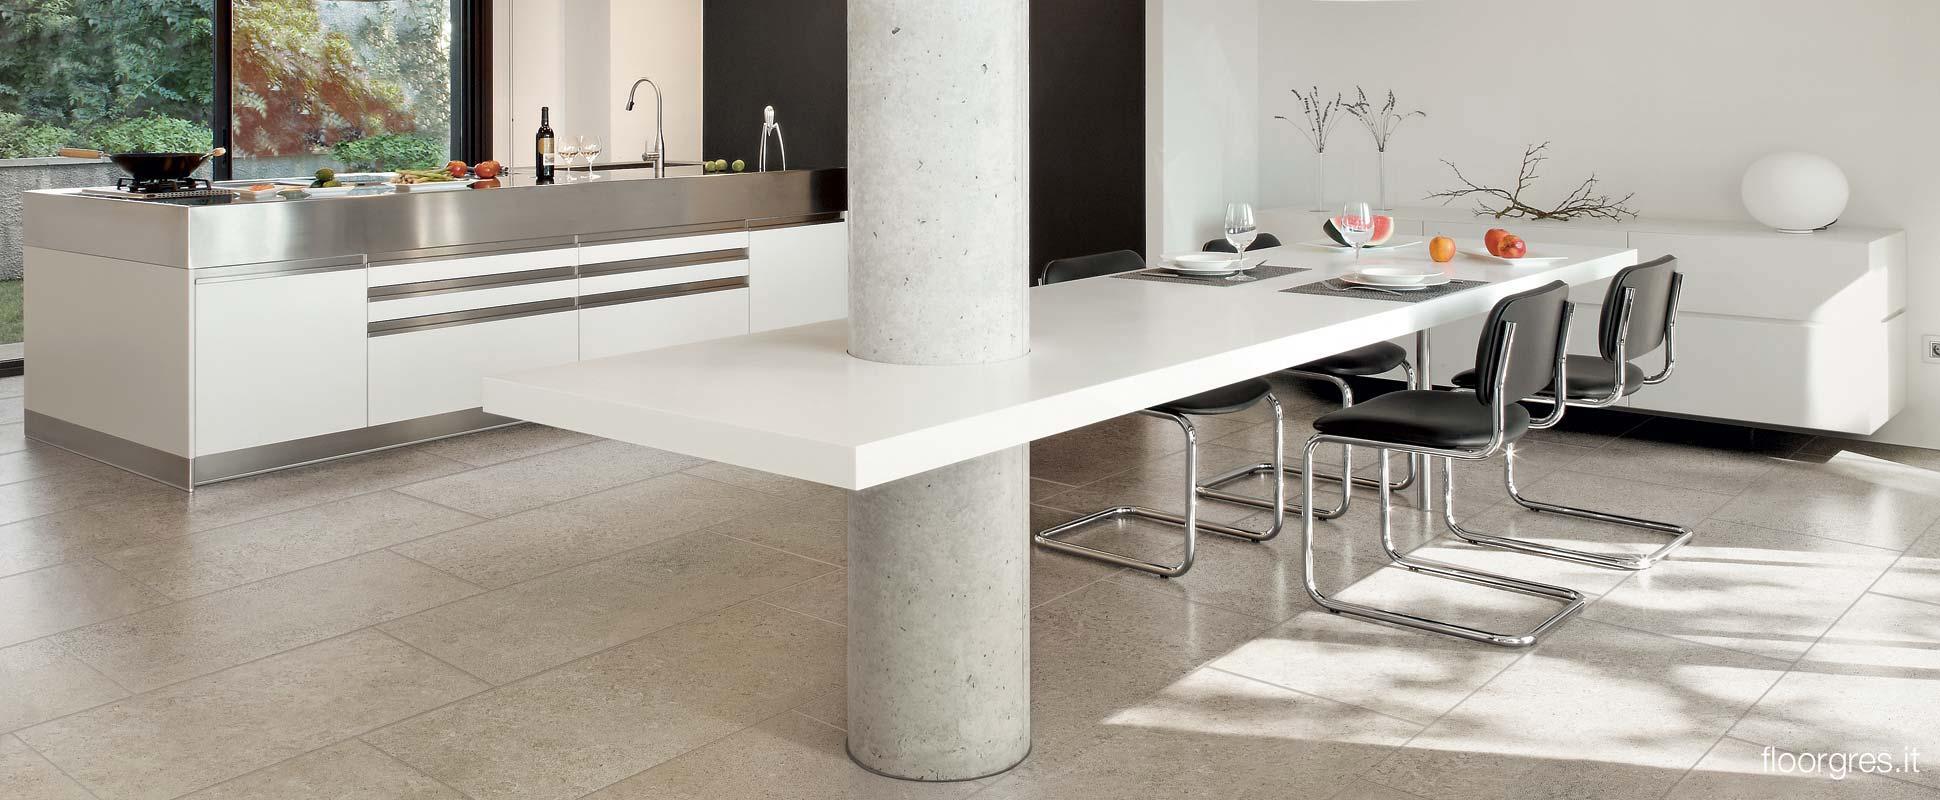 Tono Bagno - Floorgress Floortech cocina